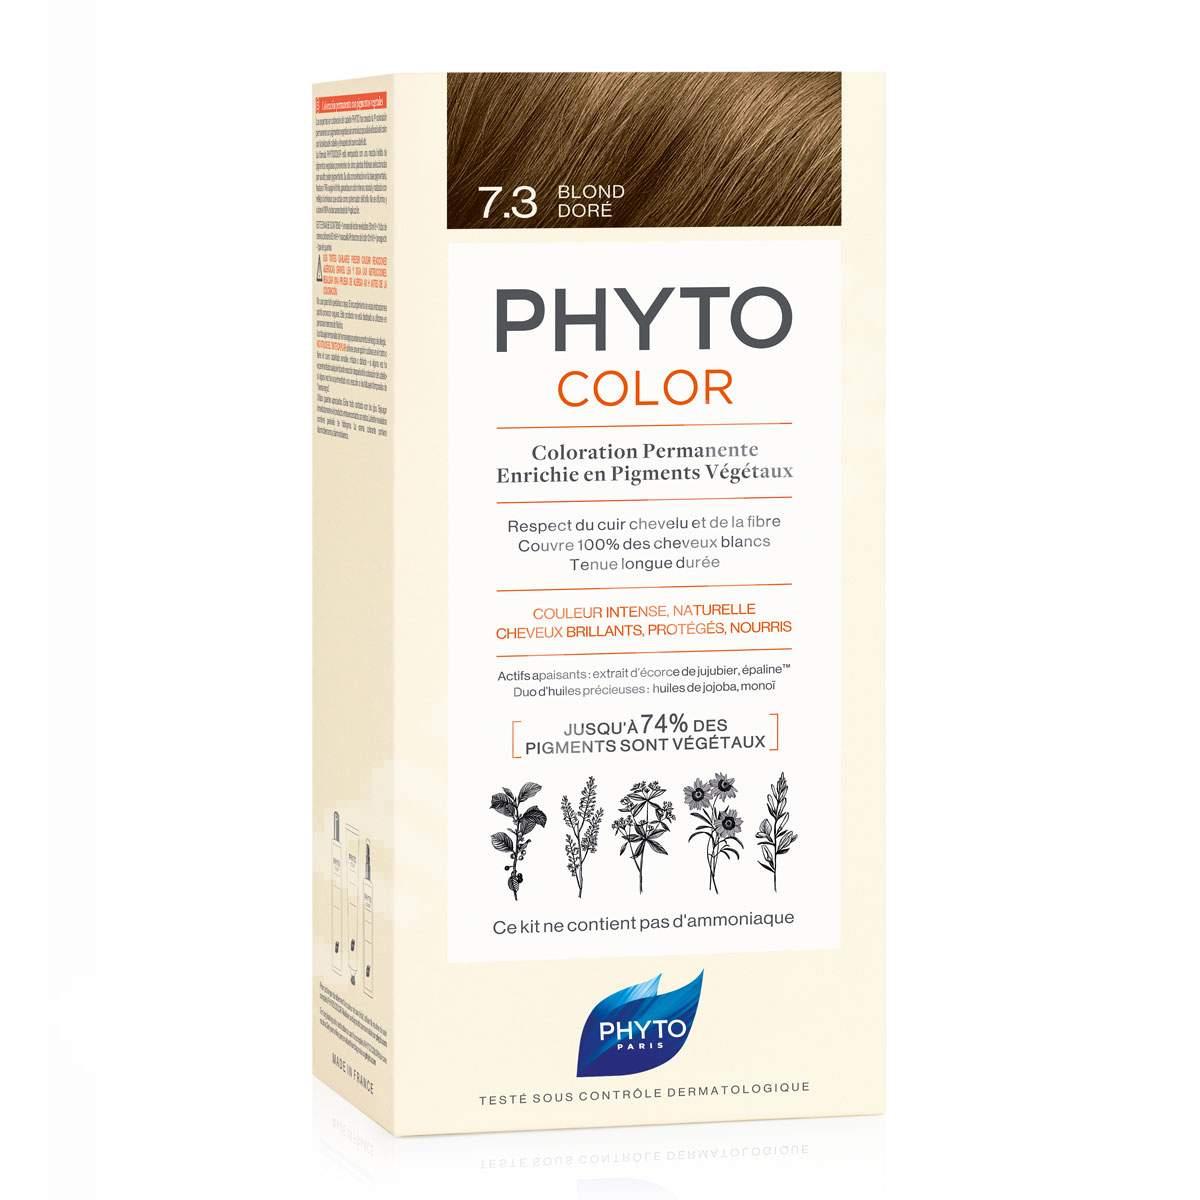 Vopsea permanenta pentru par Phytocolor, Golden Blonde (blond auriu) 7.3, 50 ml, Phyto